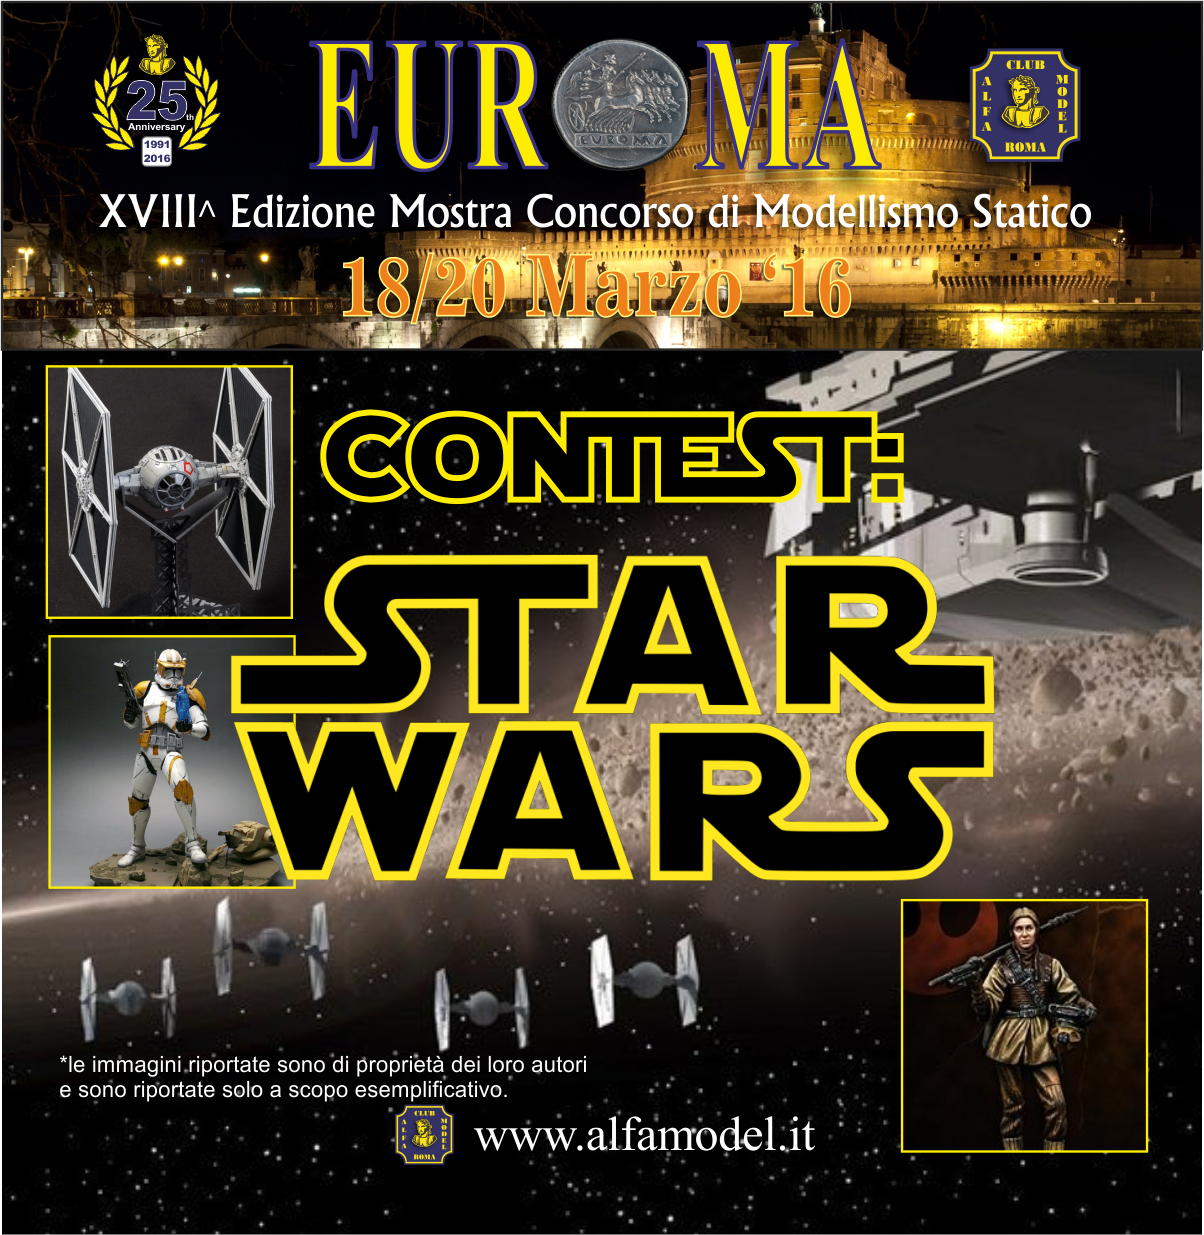 Contest Star Wars